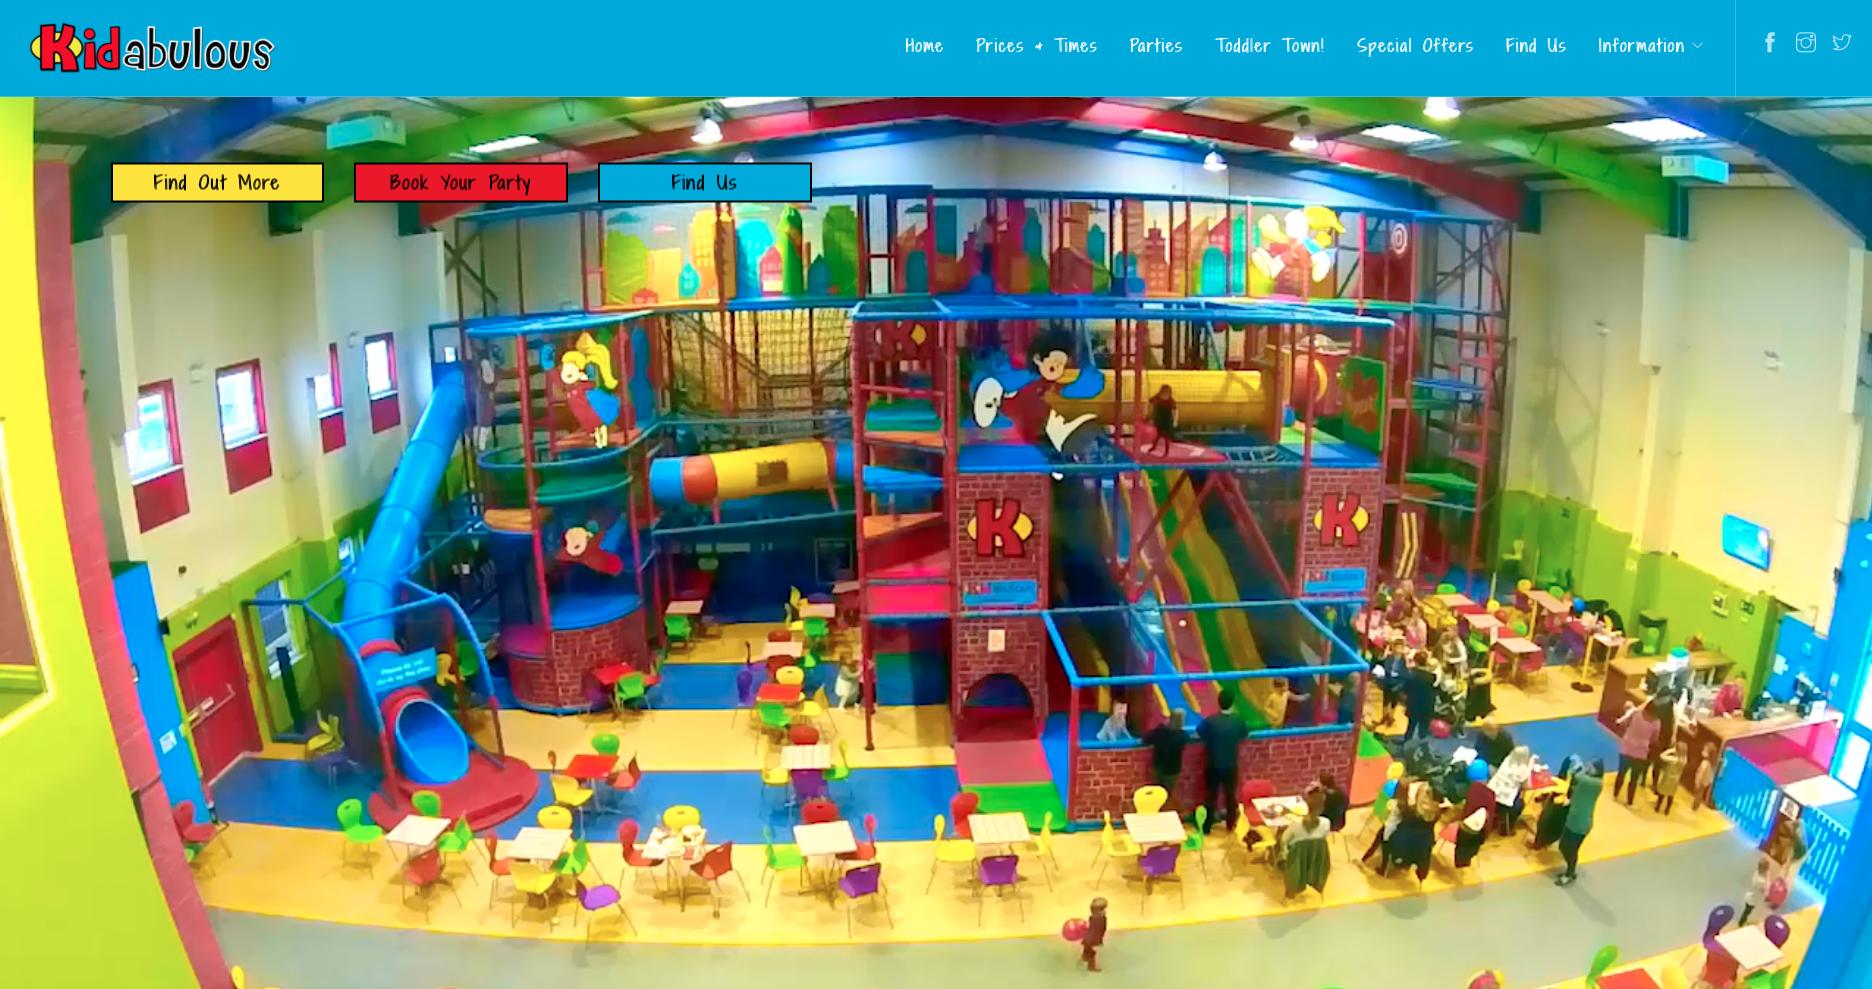 Kidabulous website refresh - home page